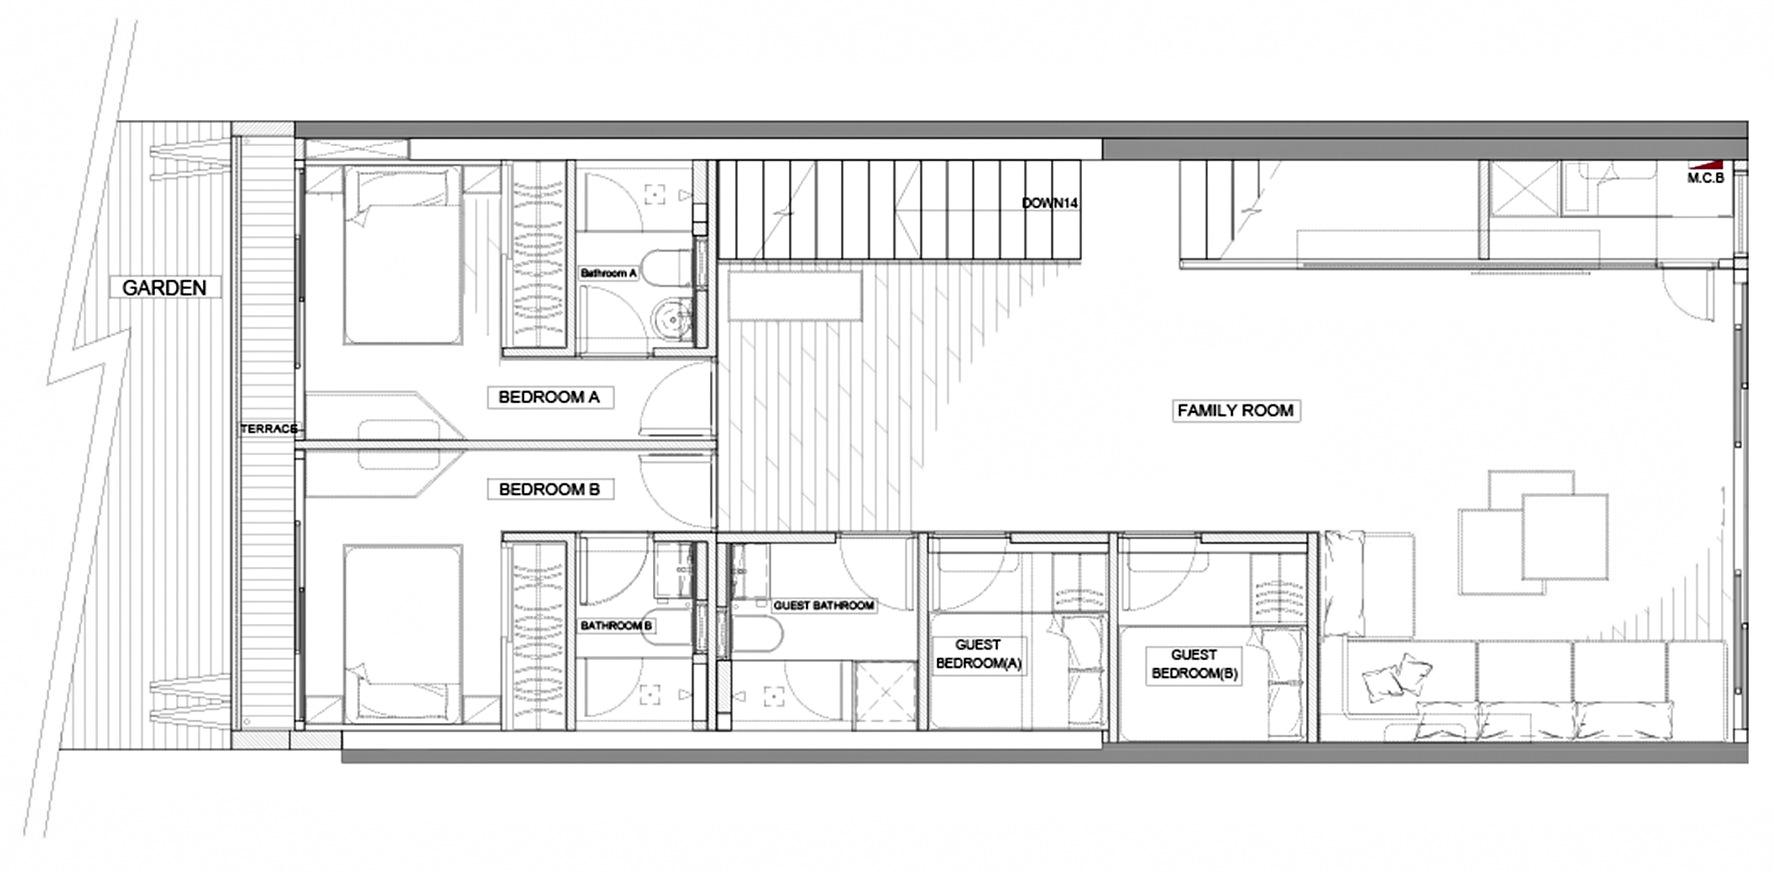 Floor Plans - Sai Kung Luxury Residence - New Territories, Hong Kong, China